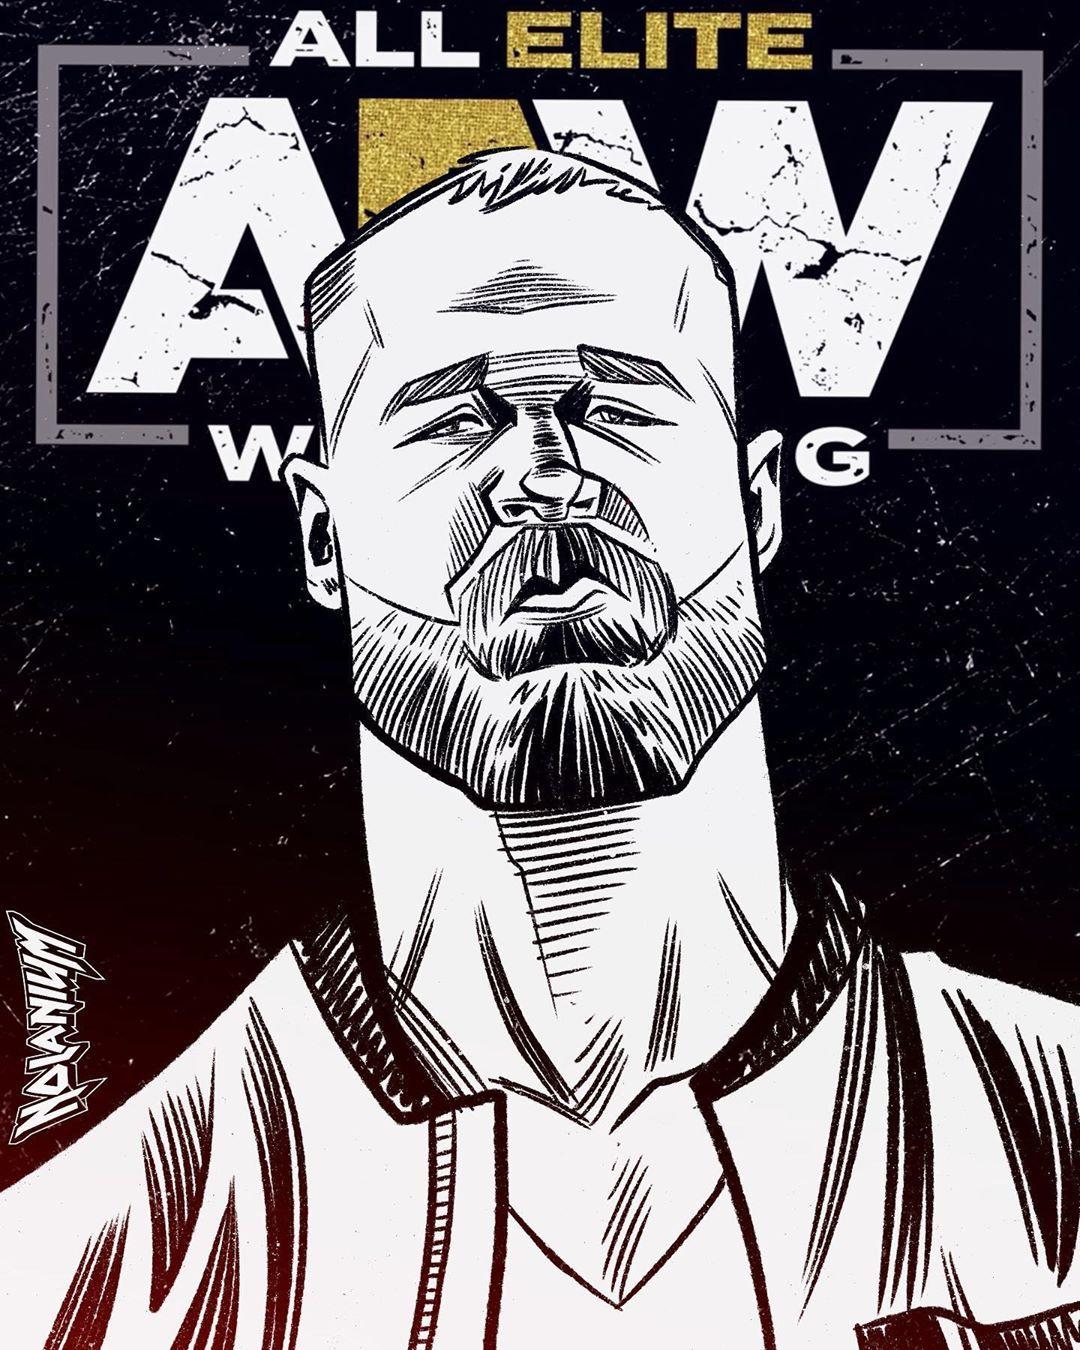 Jon Moxley Is All Elite Allelitewrestling Aewdon Doubleornothing Jonmoxley Mox Deanambrose Allelitewrestling Aew Wwe Wallpapers Wrestling Stars Wwf